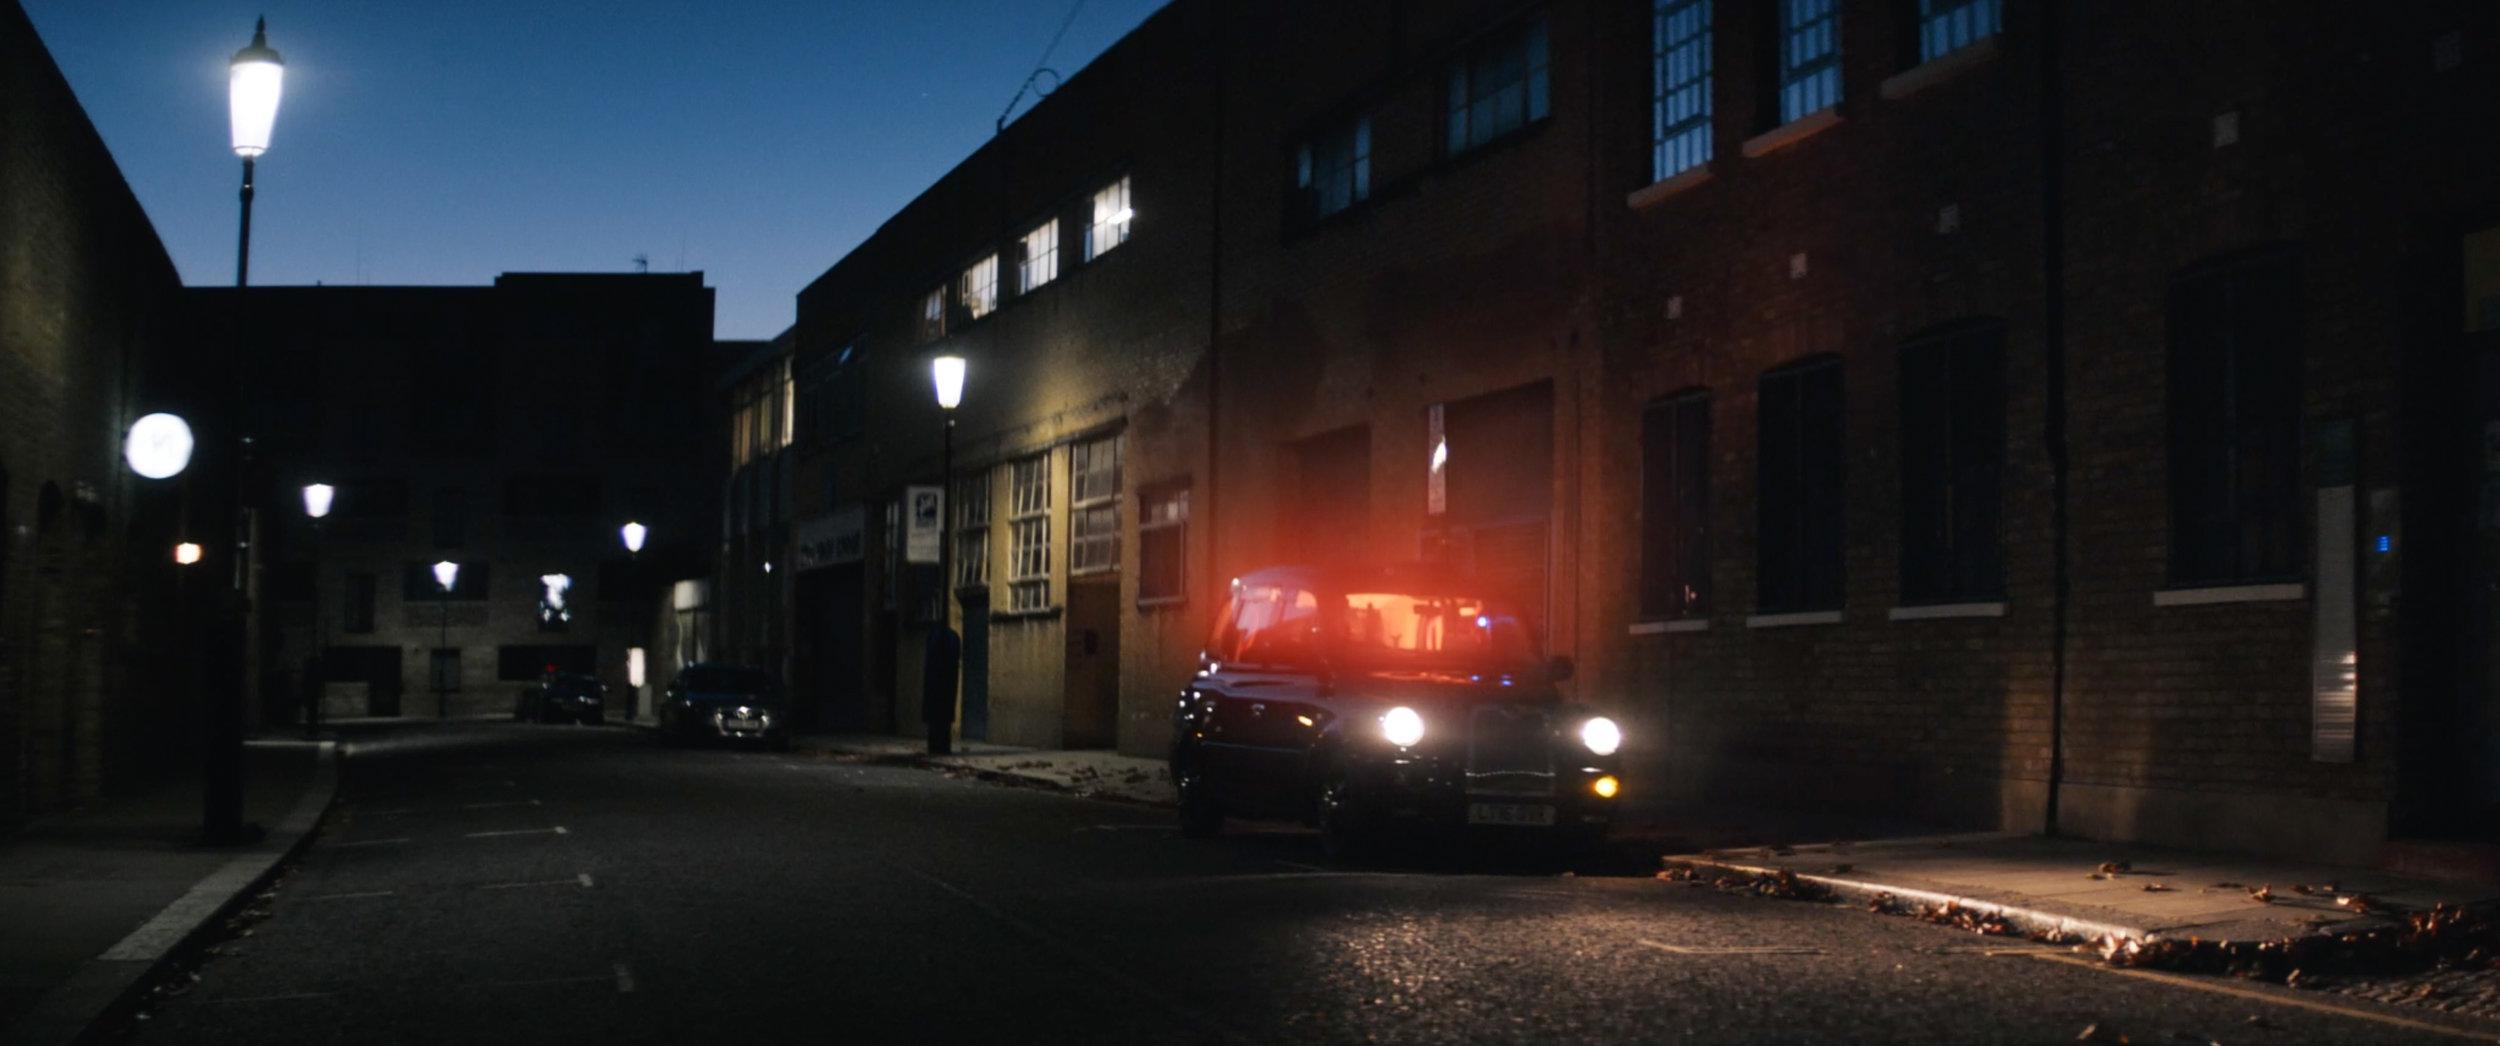 7. Popsa - Glow - William Markarian-Martin.jpg